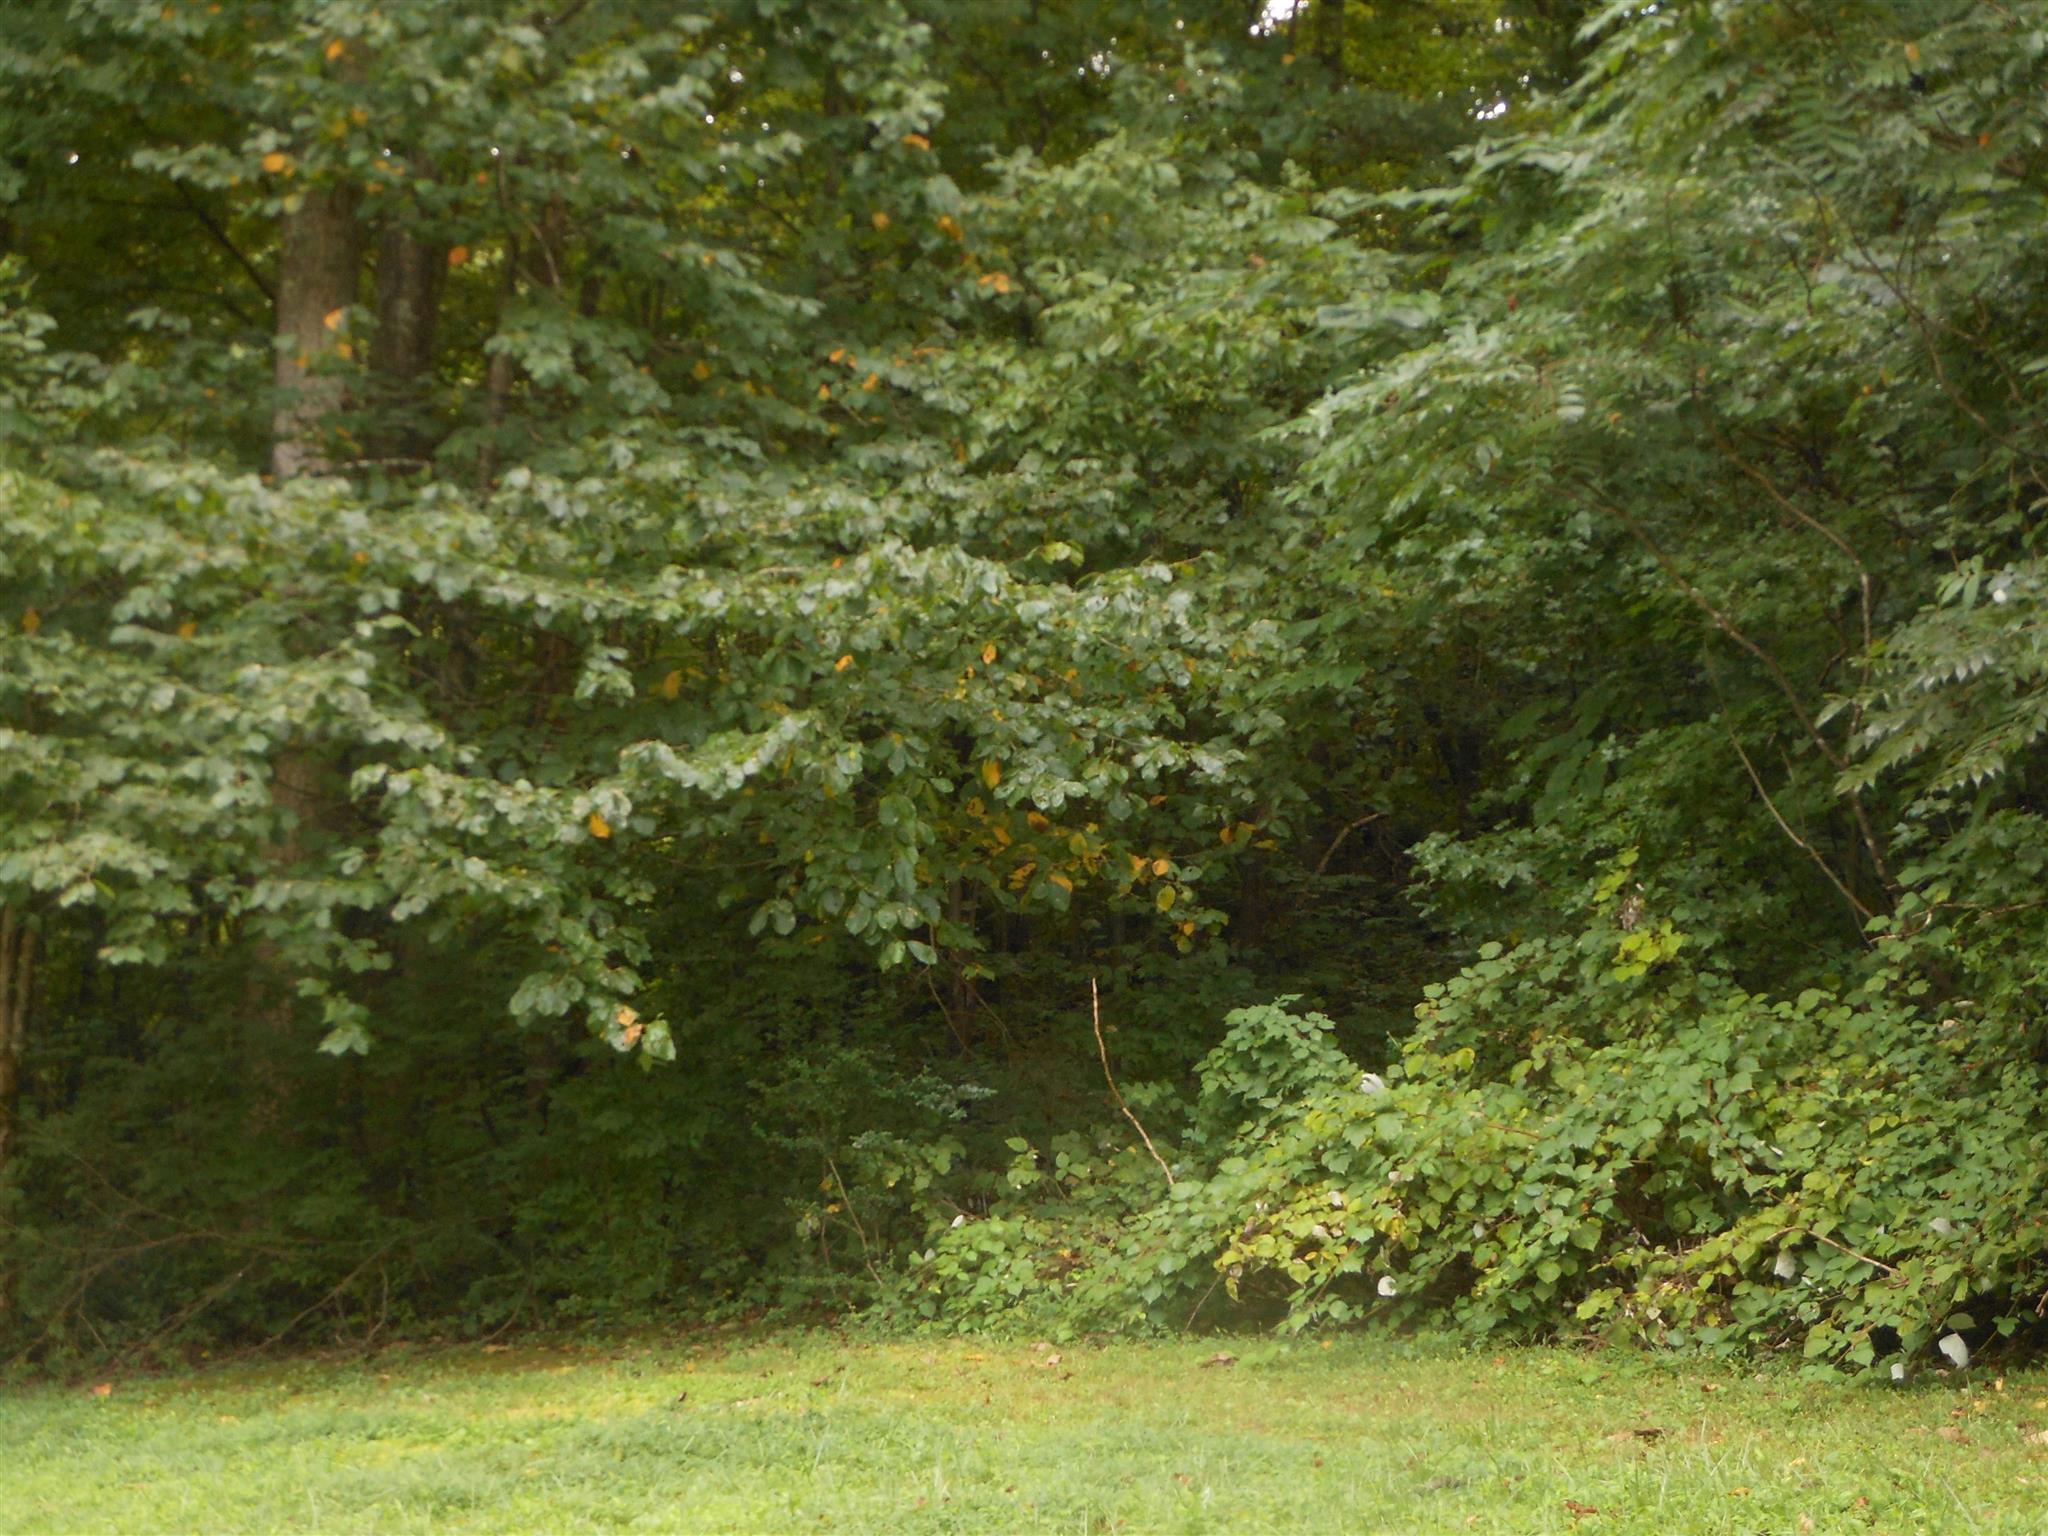 0 Tranham Rd, Whites Creek, TN 37189 - Whites Creek, TN real estate listing